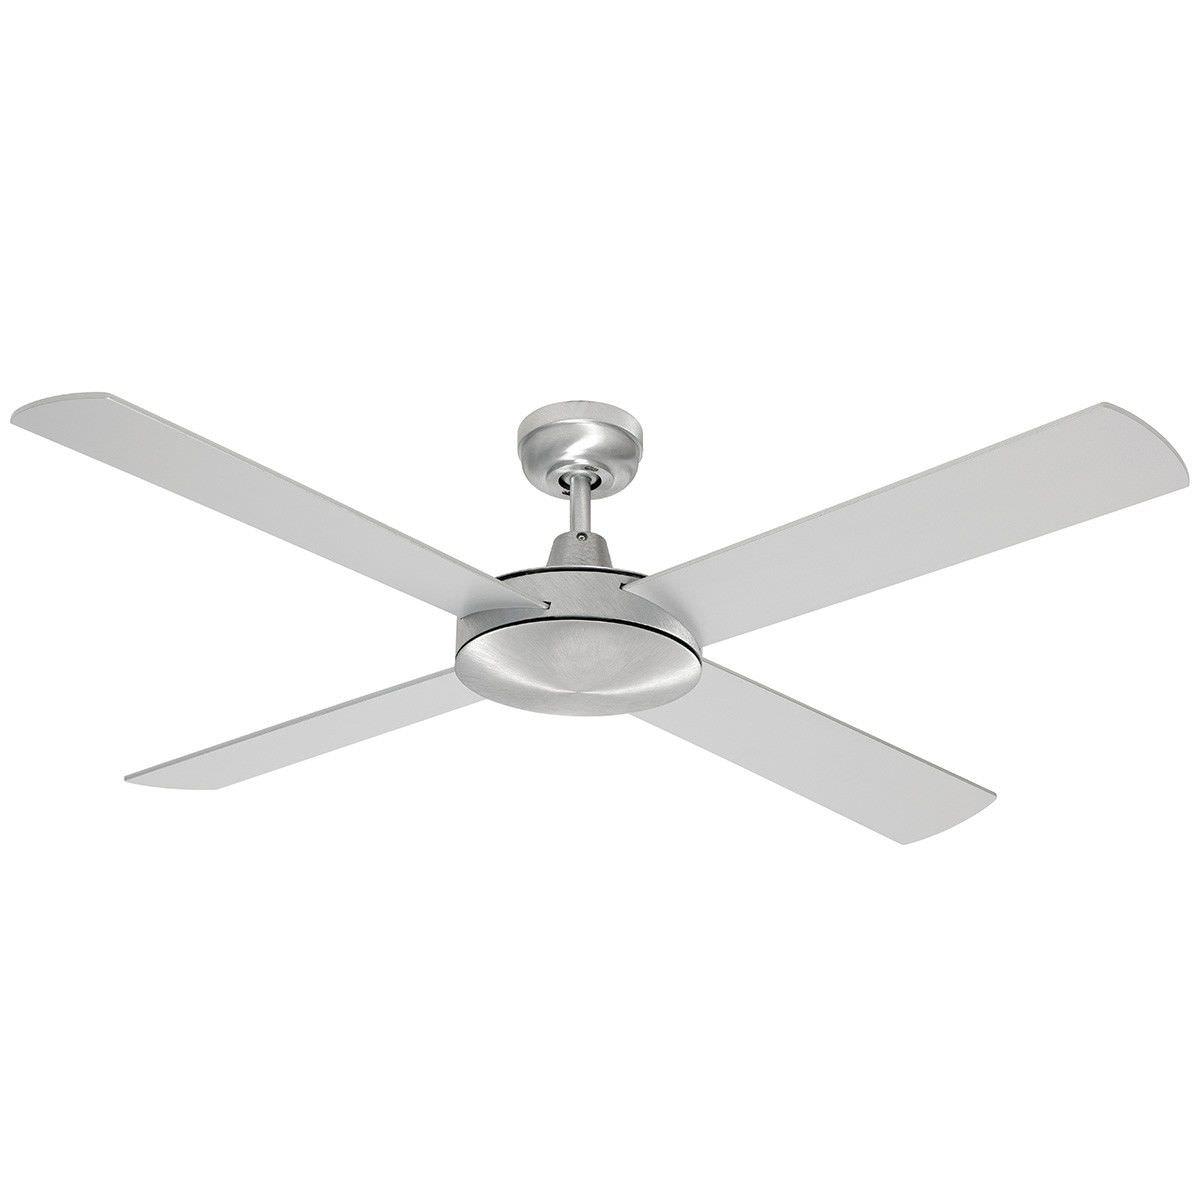 "Grange Timber Ceiling Fan, 130cm/52"", Brushed Steel"